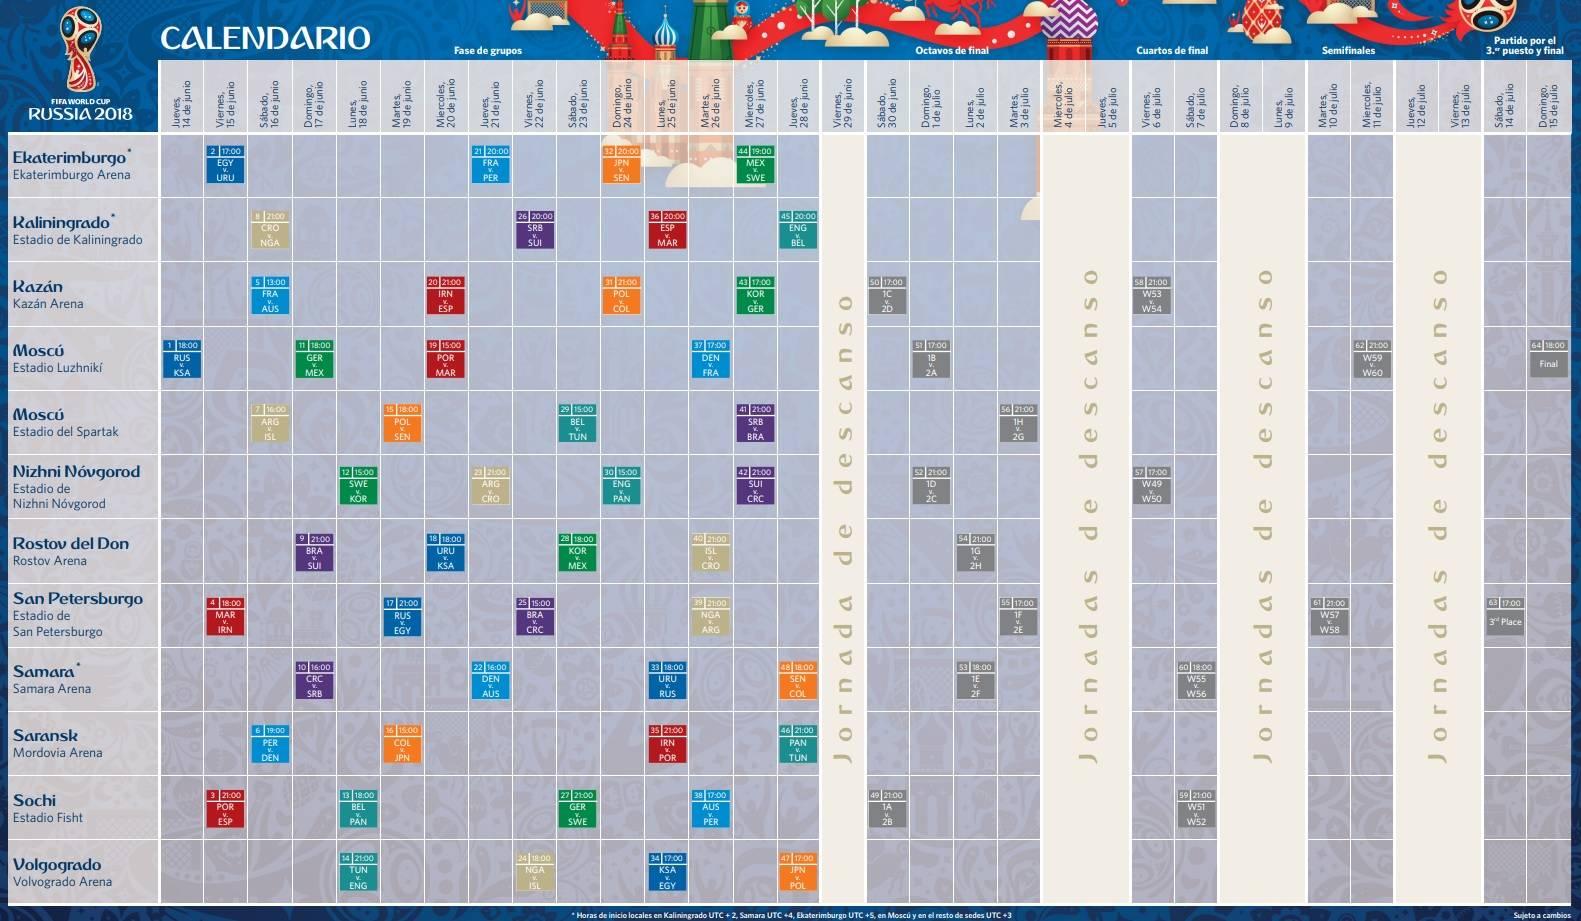 Calendario Mundial Rusia 2018.Como Tener Todo El Calendario Del Mundial De Rusia 2018